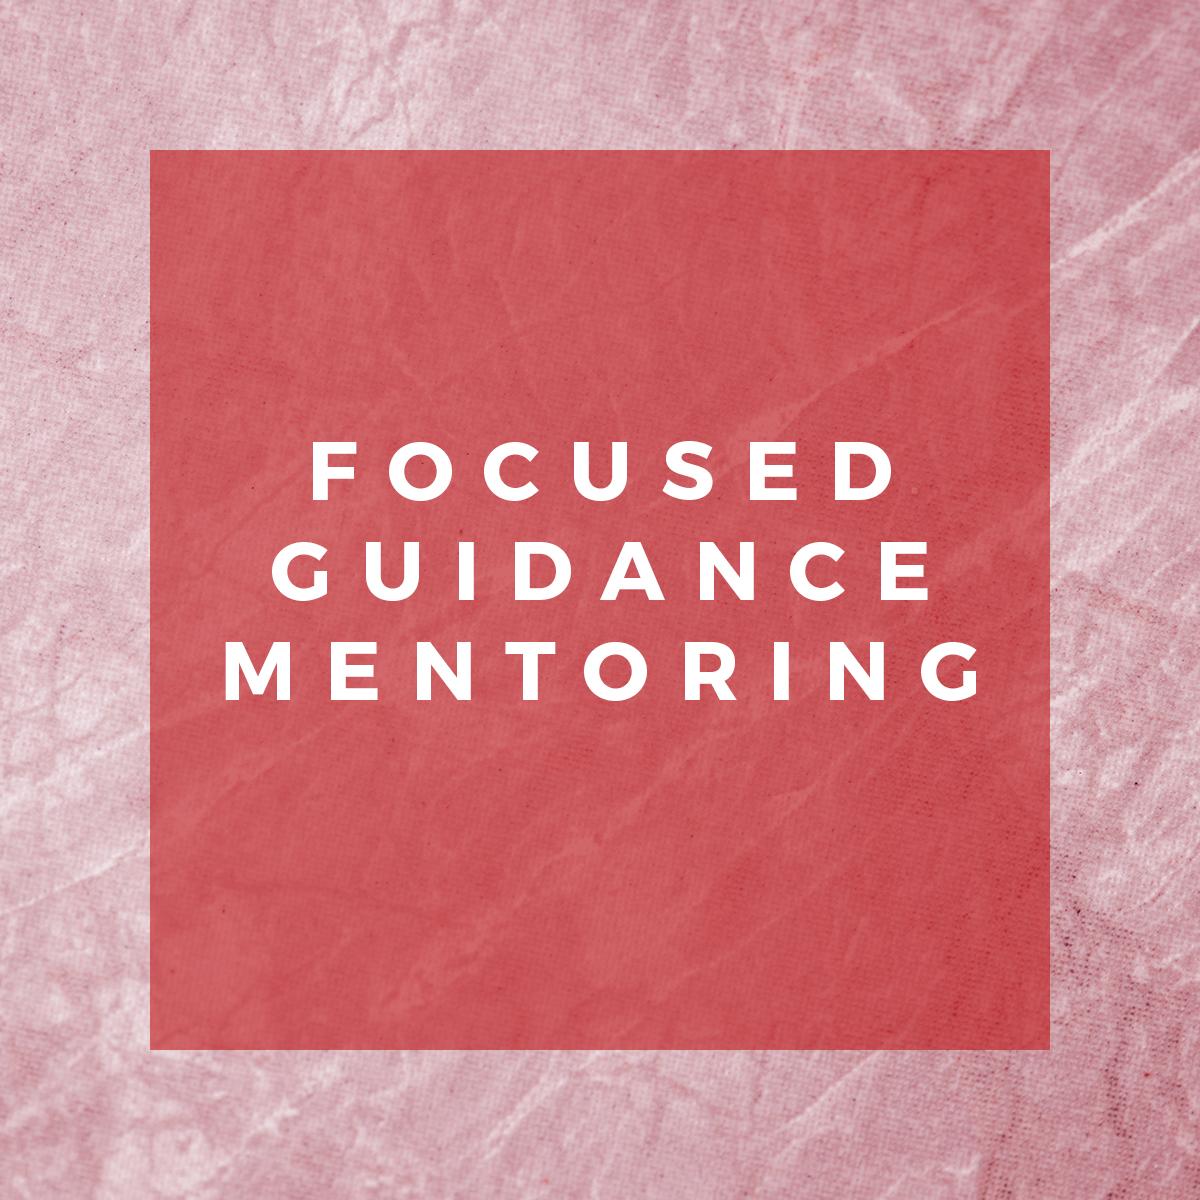 Focused-Guidance-Mentoring.jpg